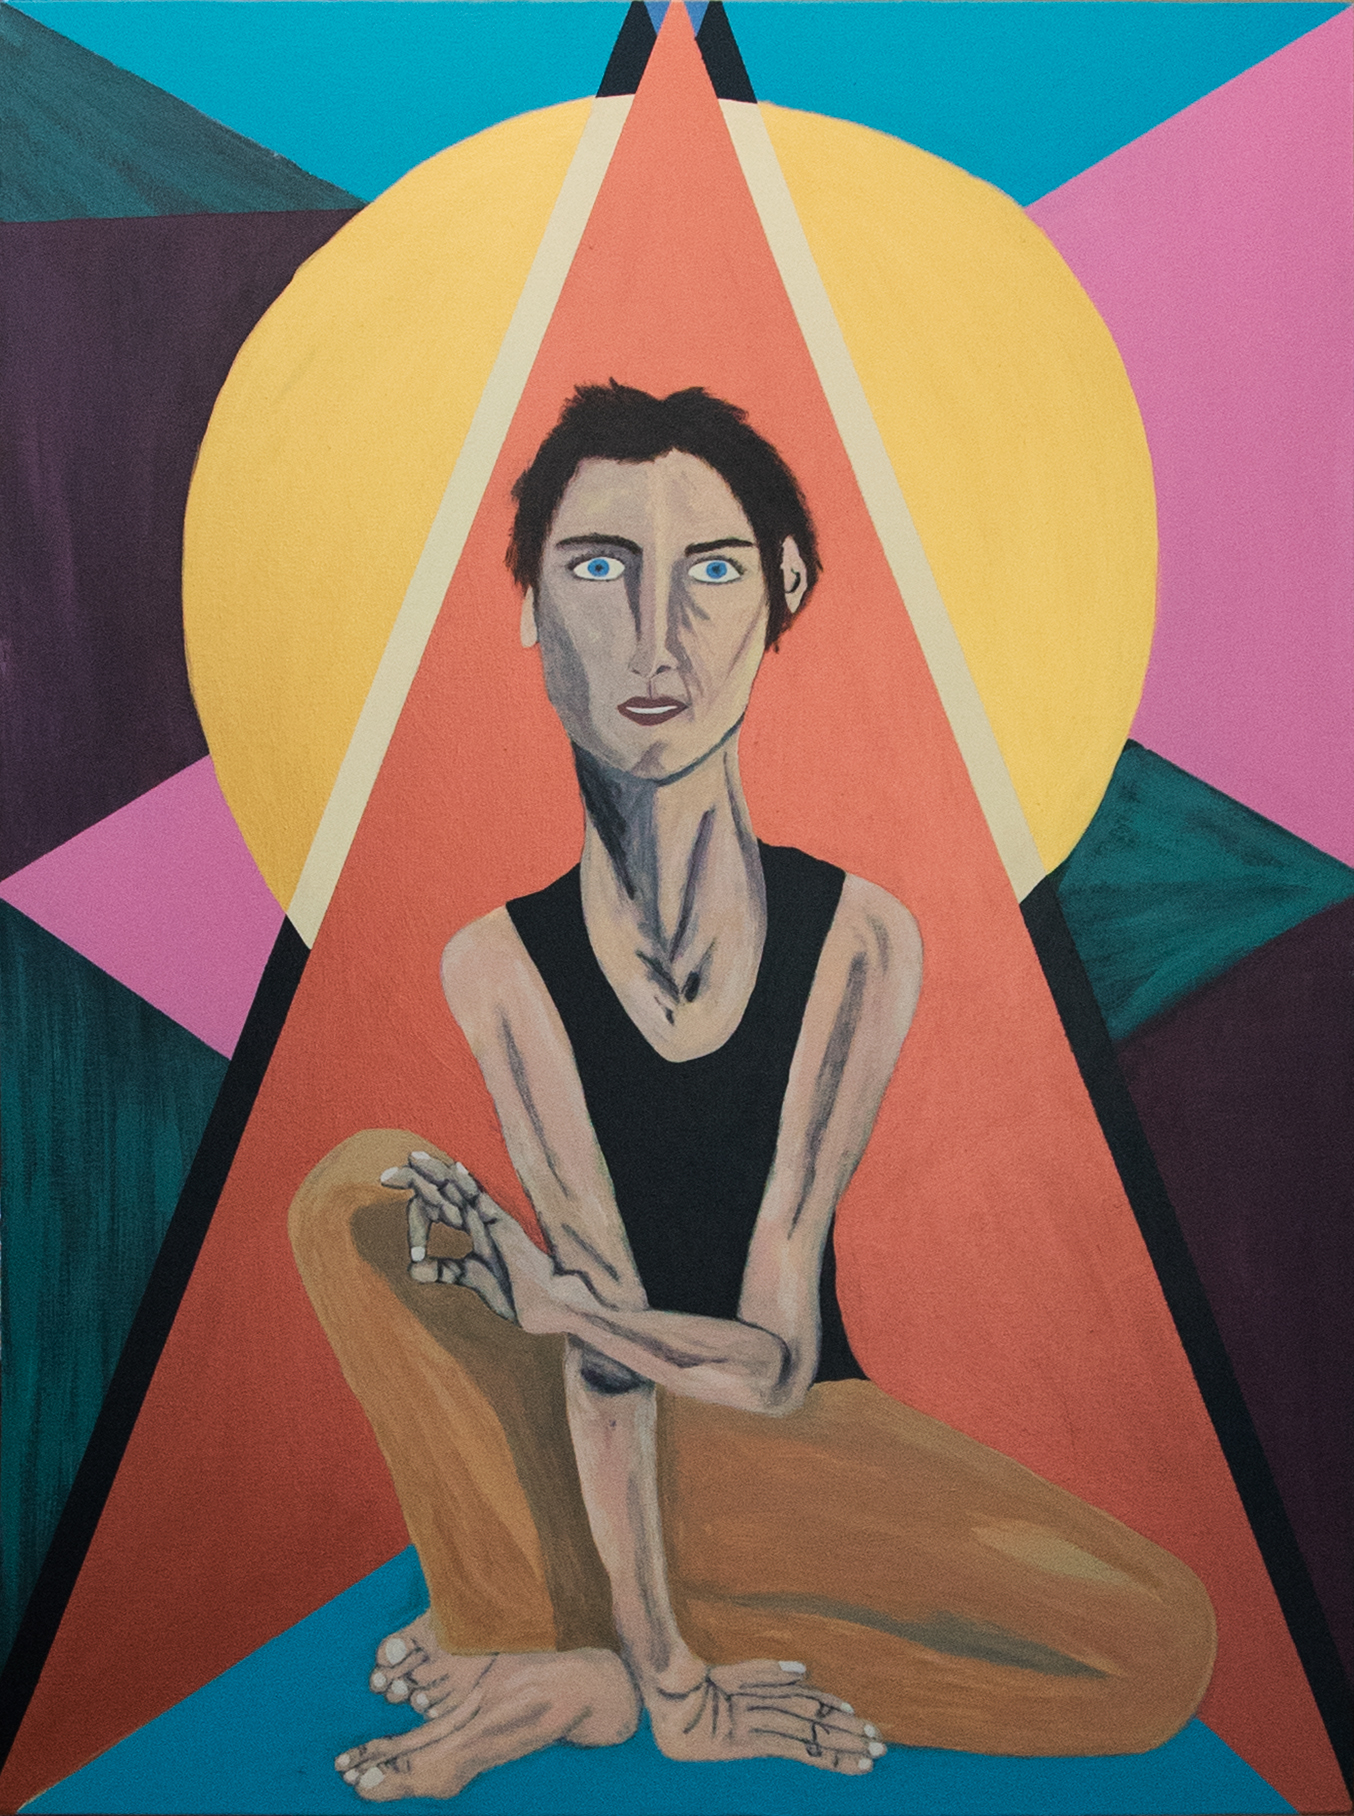 Portrait of fine young man, Édith Perrenot, 2018 copy web.jpg